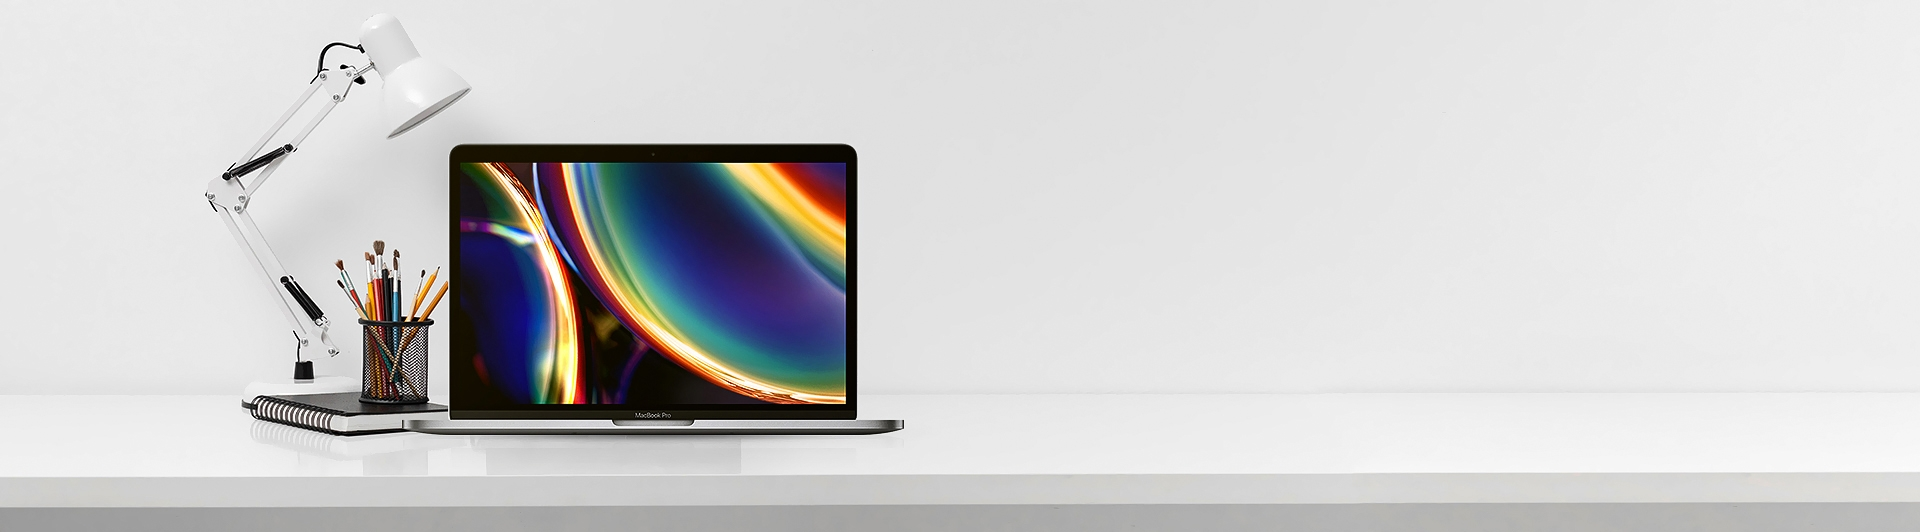 Apple Macbook Pro i5 13.3 inch MXK32SA/A 2020